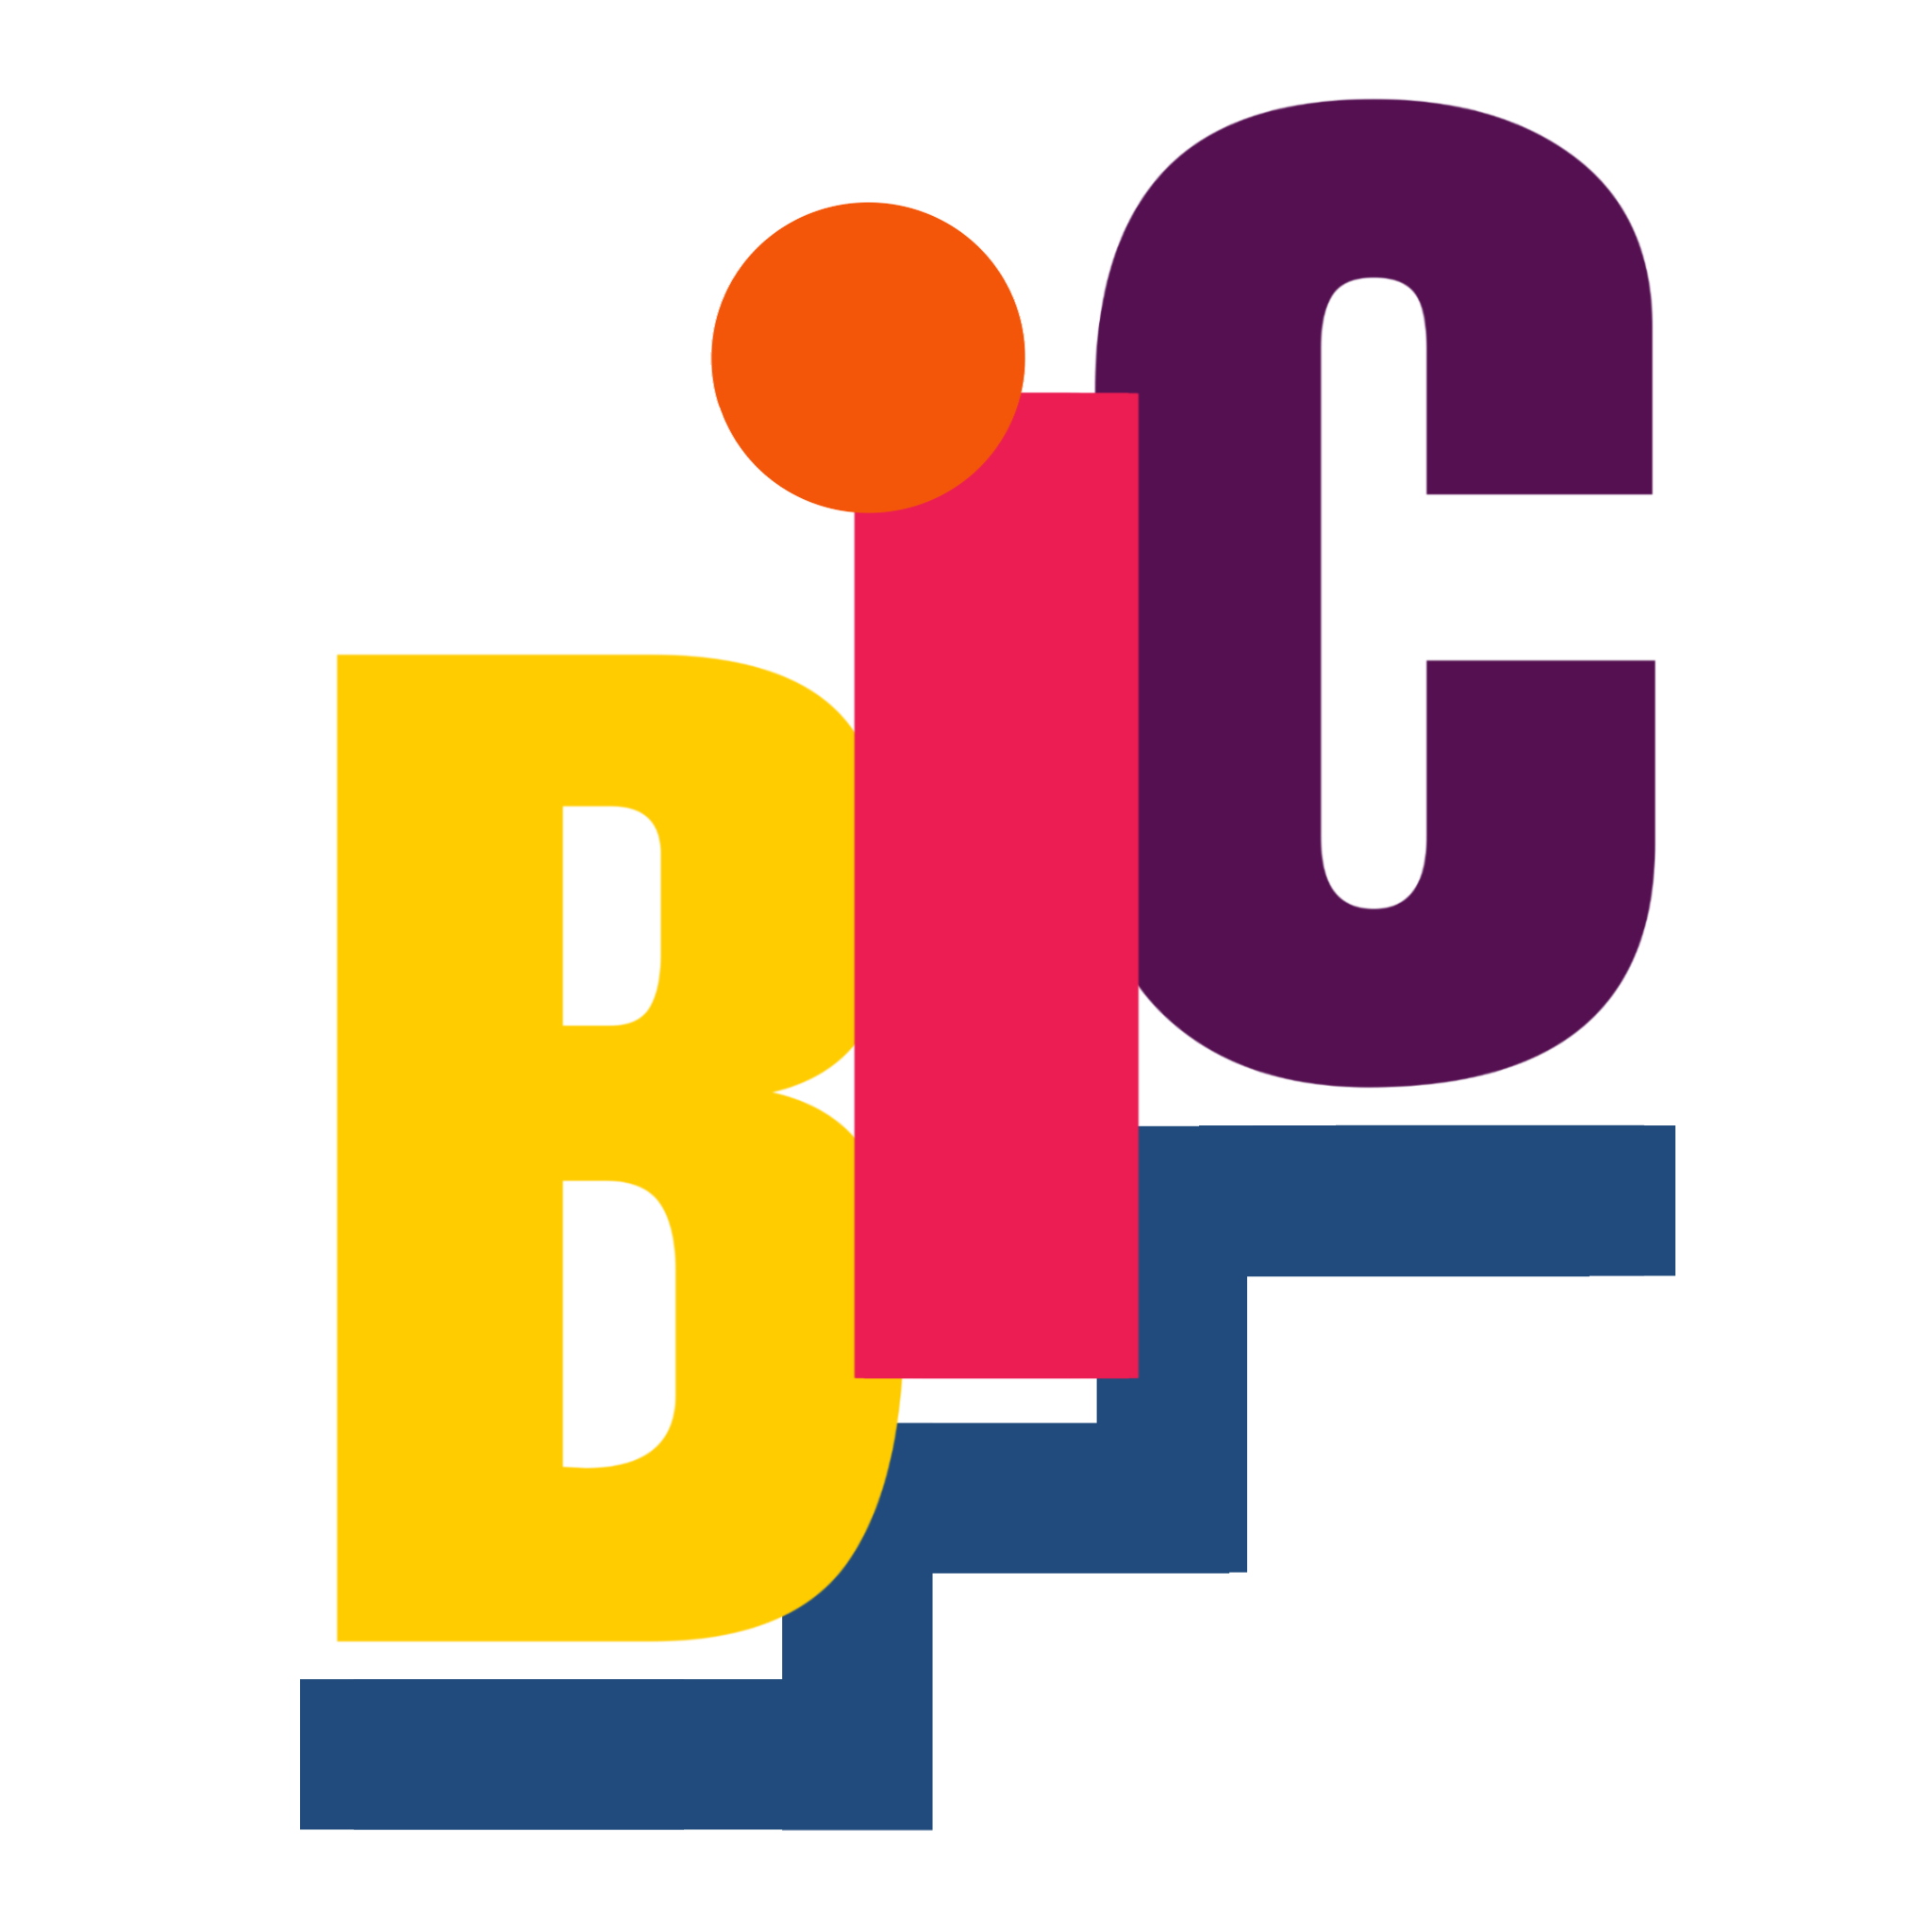 Bic project Logo